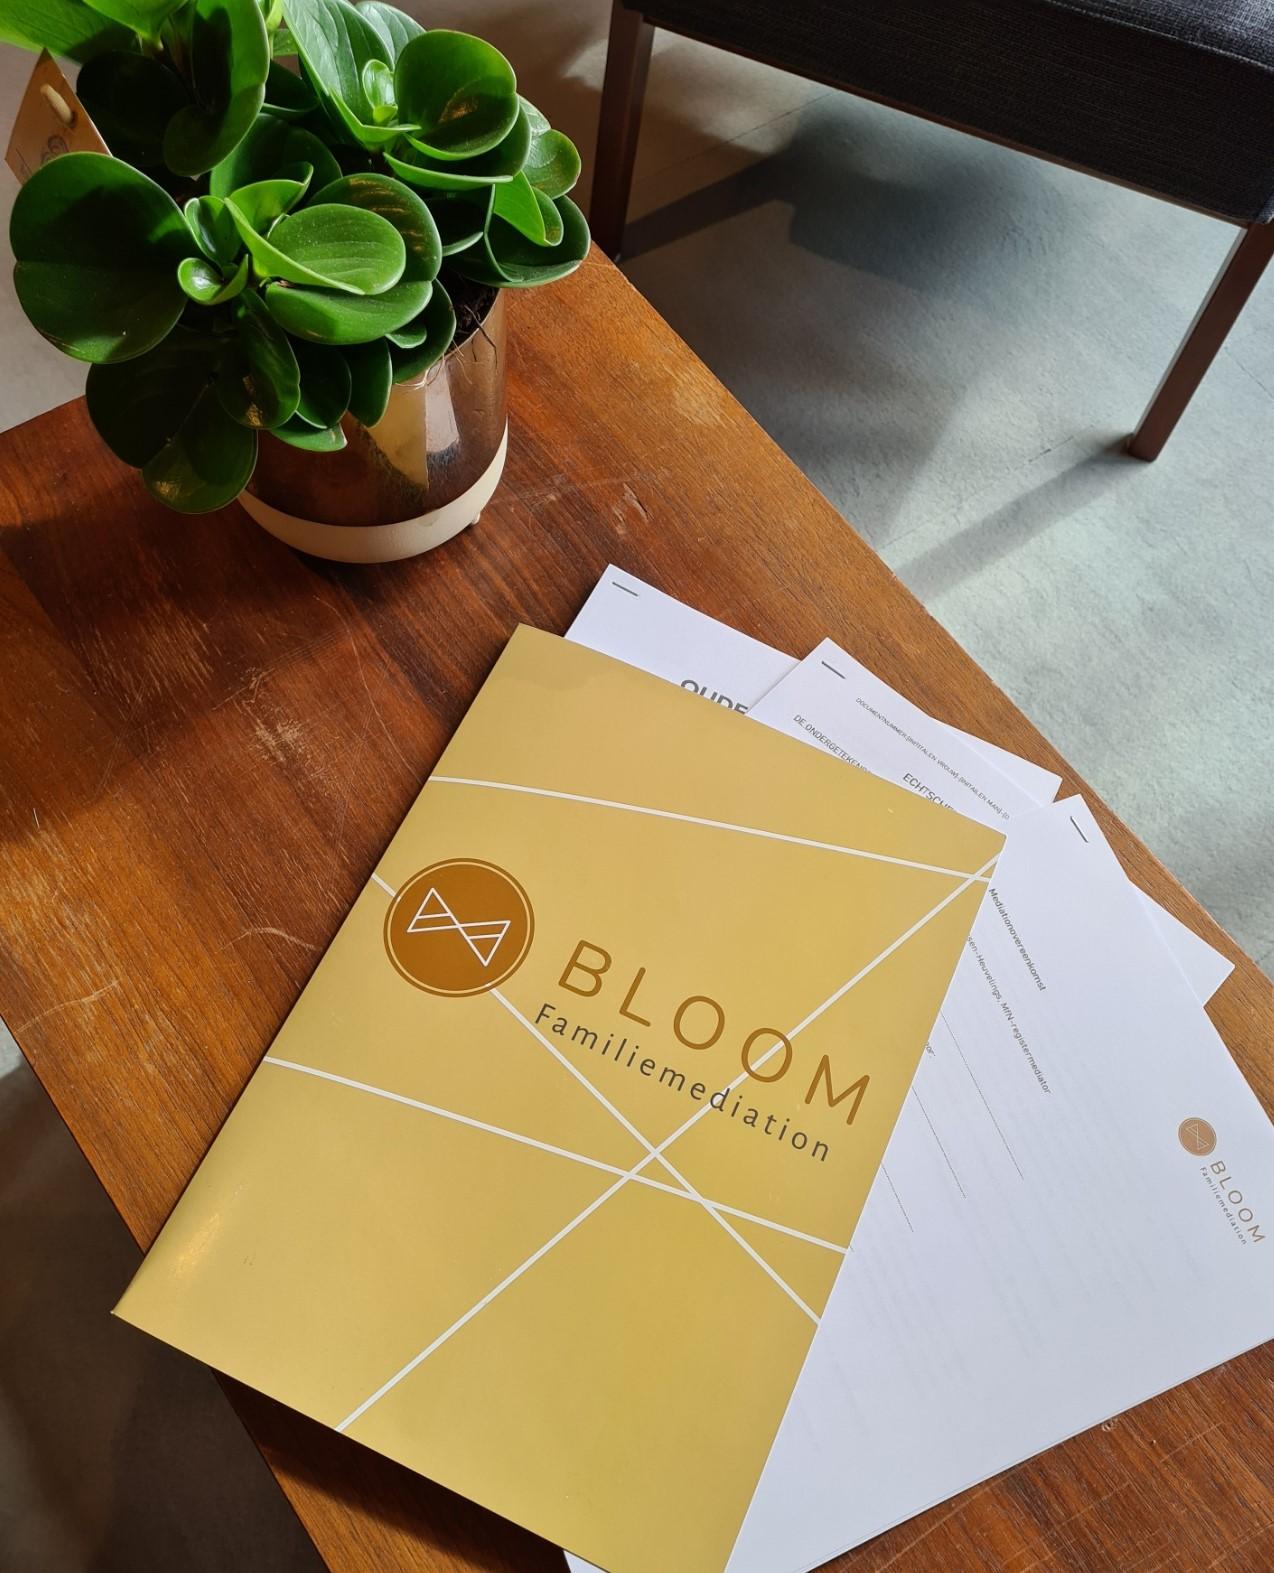 BLOG BY BLOOM: U gaat scheiden: wat nu?